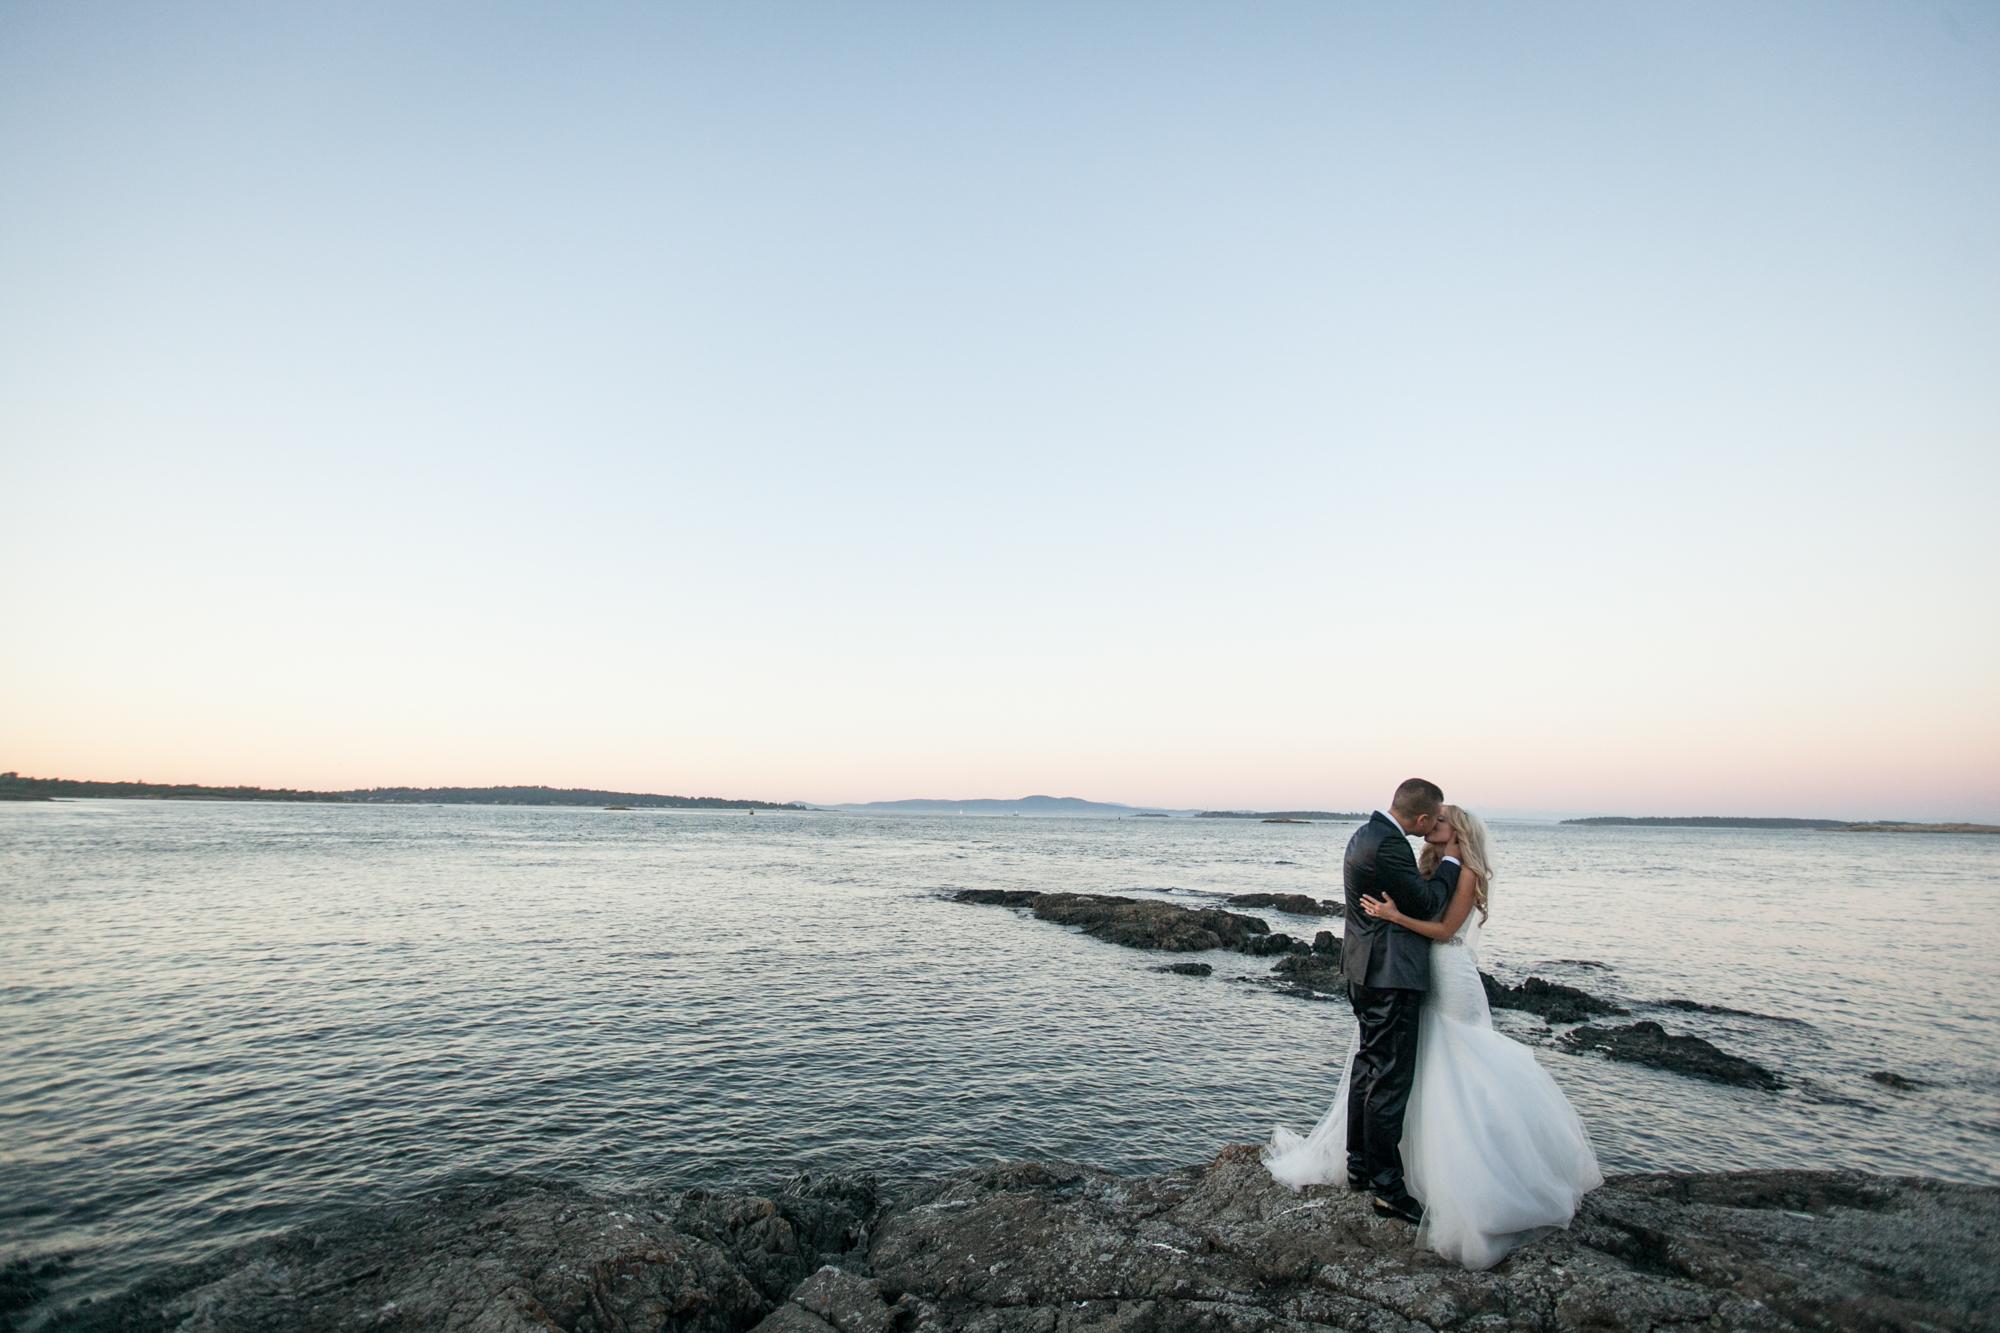 vancouver-luxury-wedding-photographer-lori-miles--12.jpg